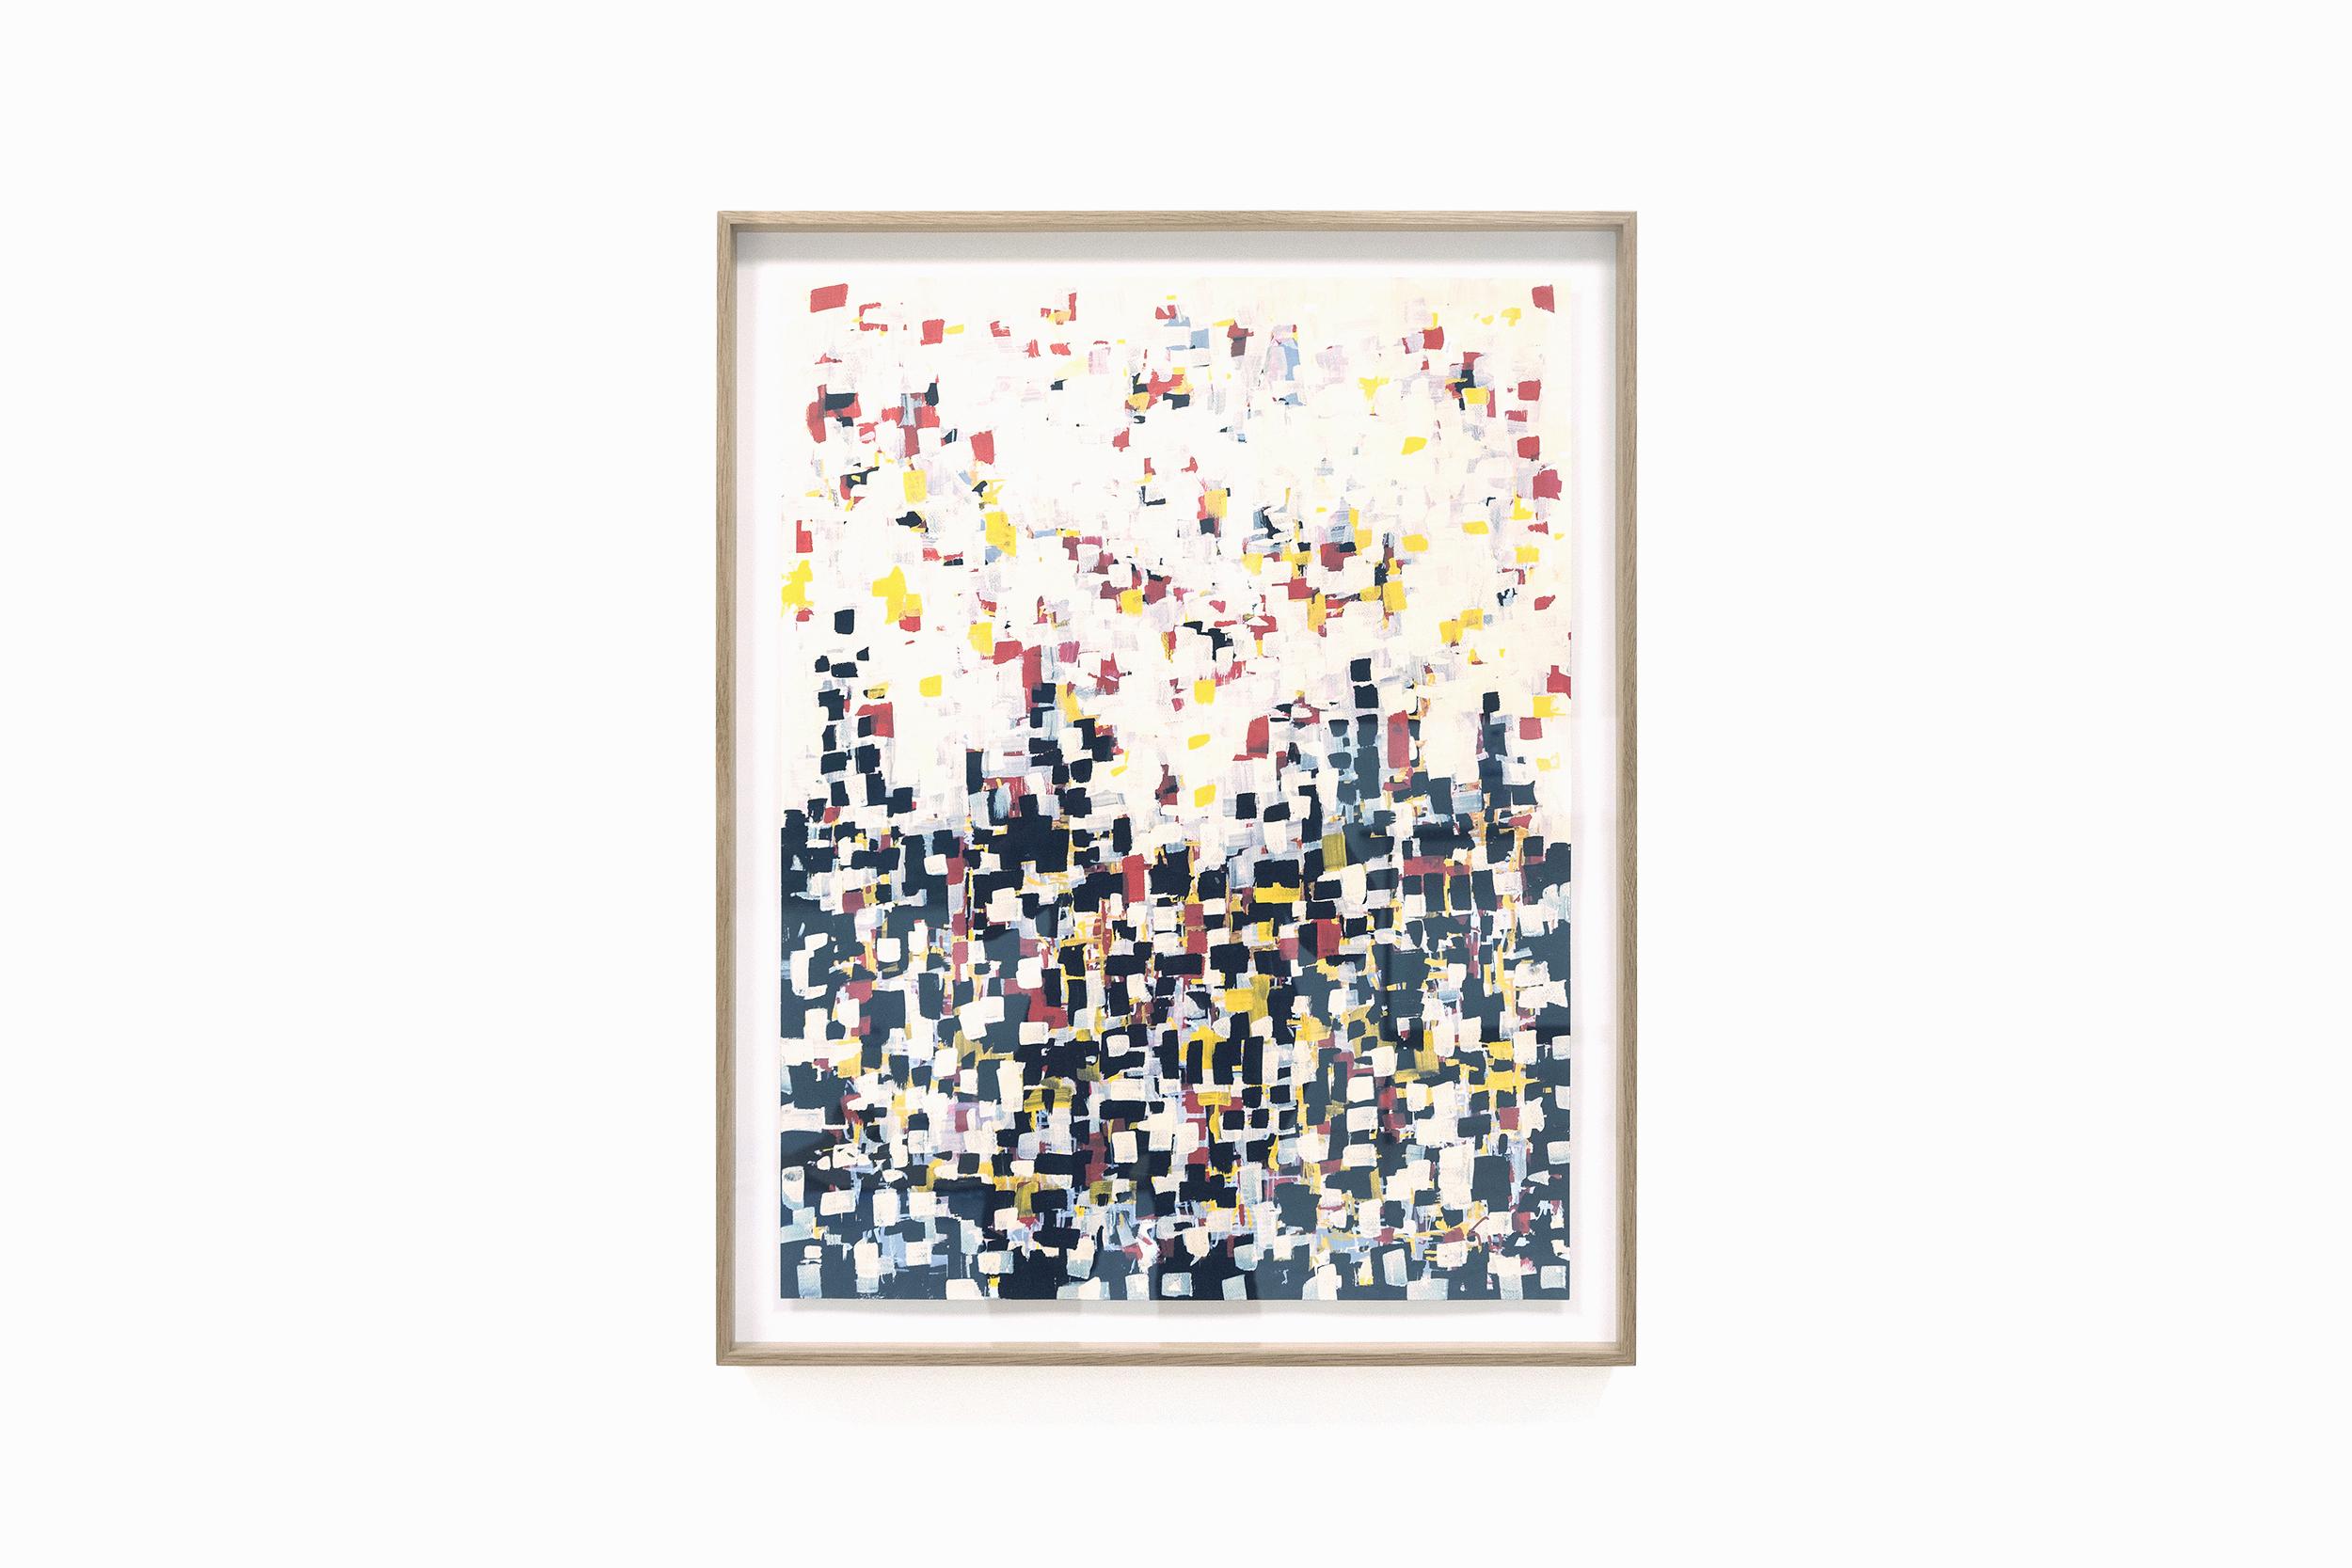 bonjourmolotov Crowded series series Illustration Ilustracao painting pintura acrylic acrílico canvas tela paper cardboard mdf Andre Gigante 03Base N7.jpg